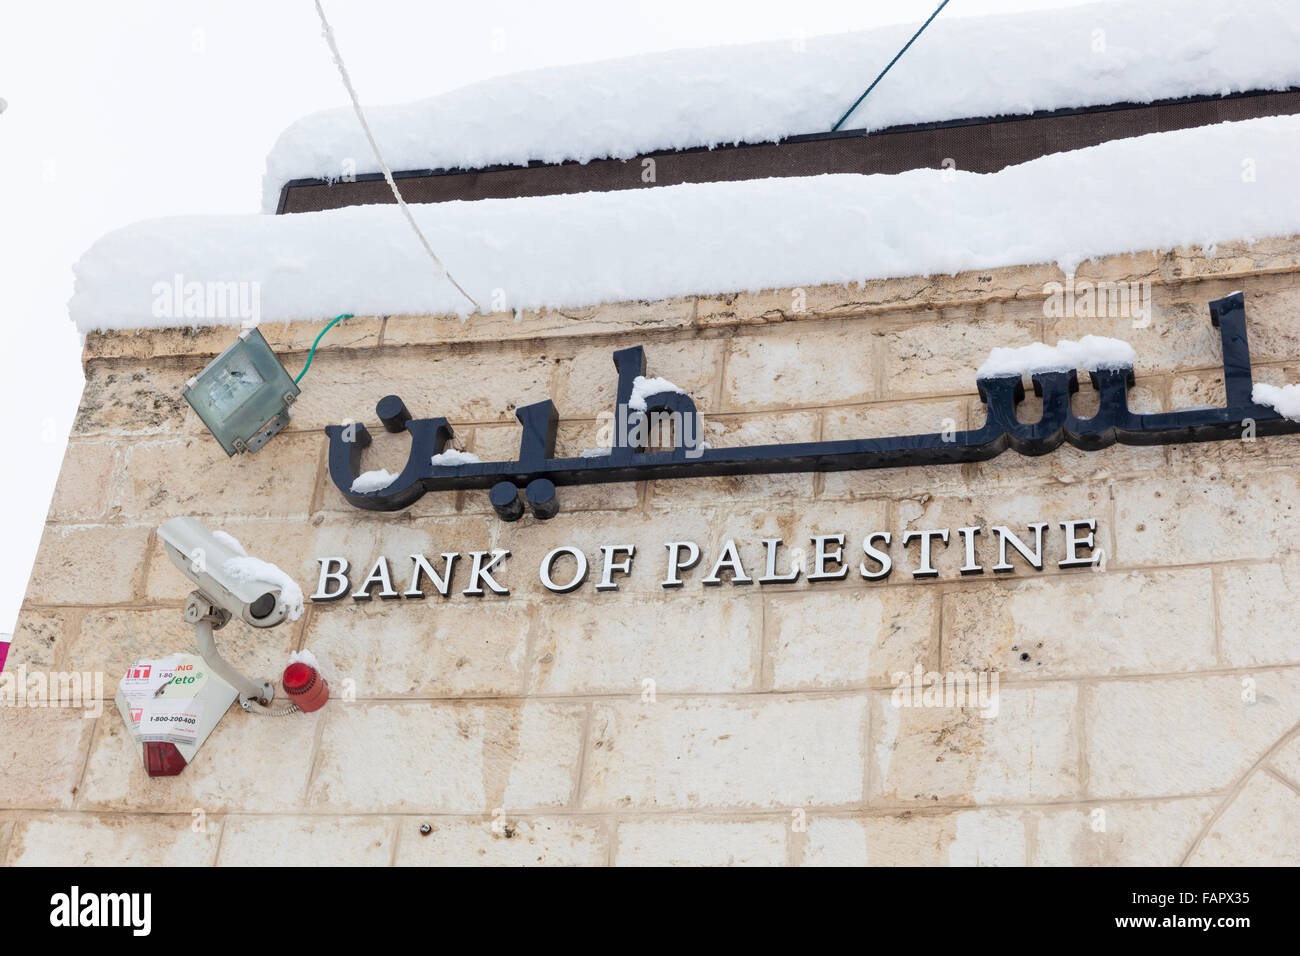 Record snow in Palestine. - Stock Image